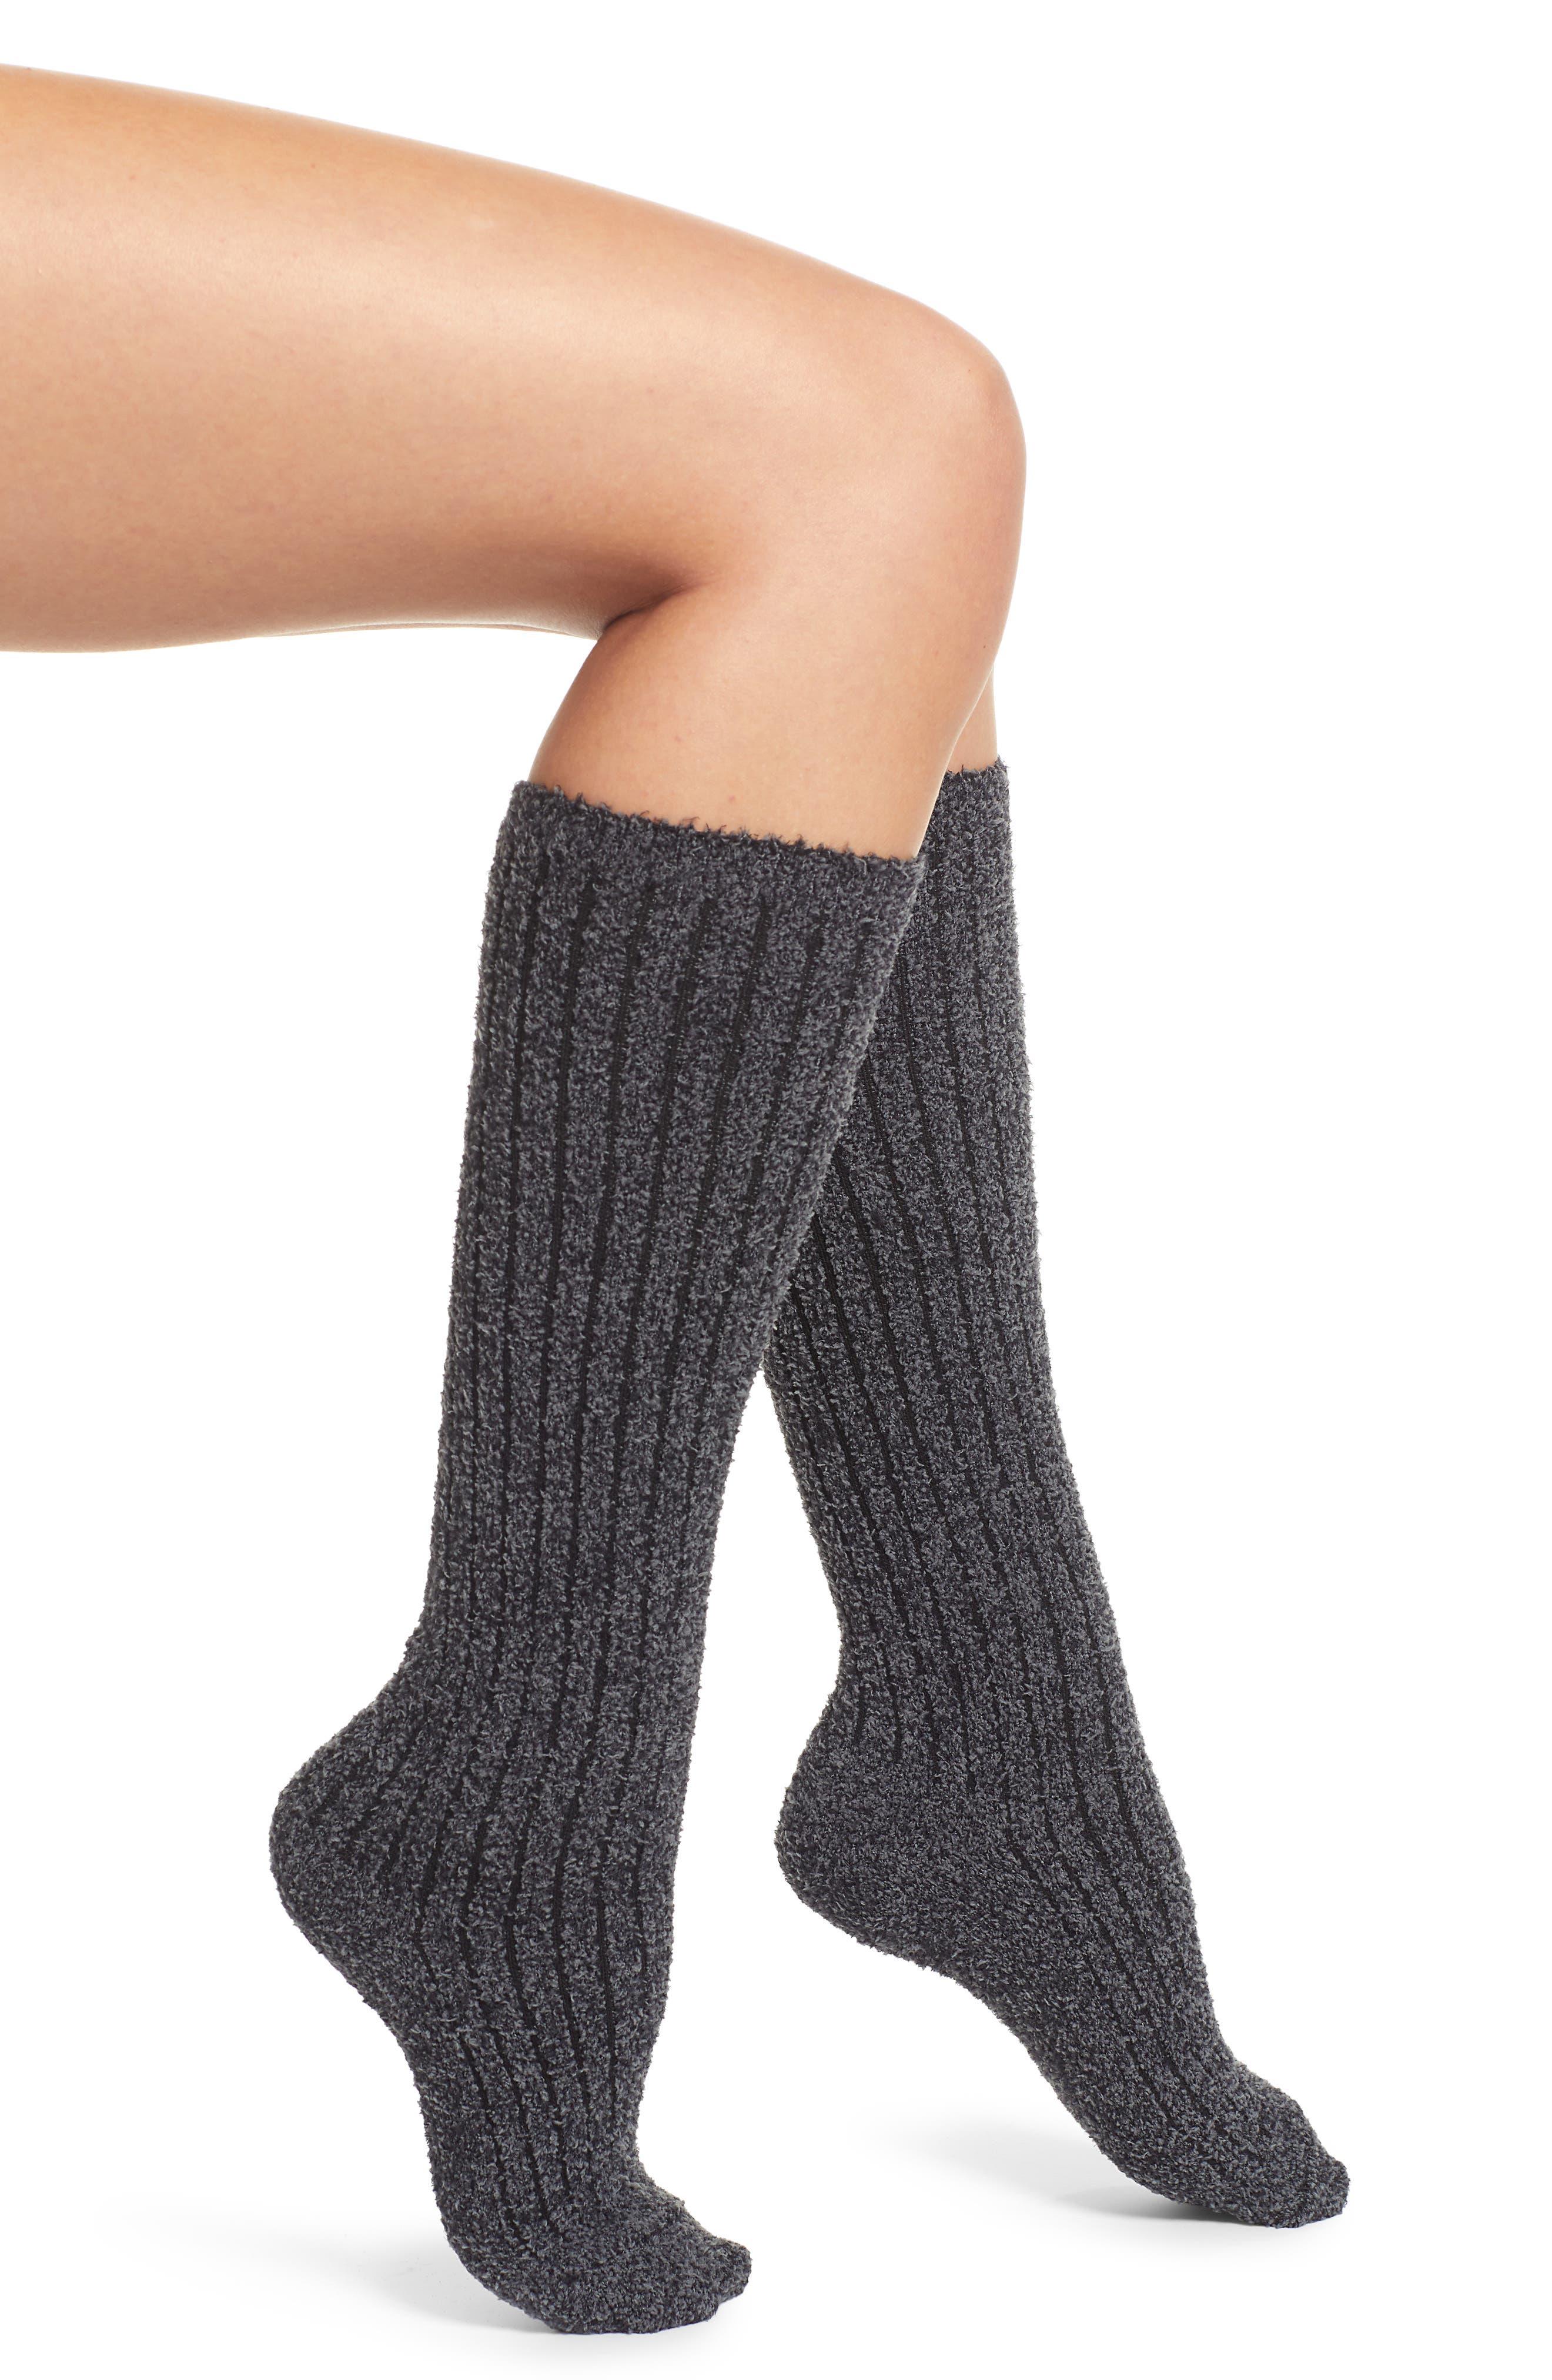 BAREFOOT DREAMS<SUP>®</SUP>,                             CozyChic<sup>™</sup> Rib Knee High Socks,                             Main thumbnail 1, color,                             HE CARBON/ BLACK